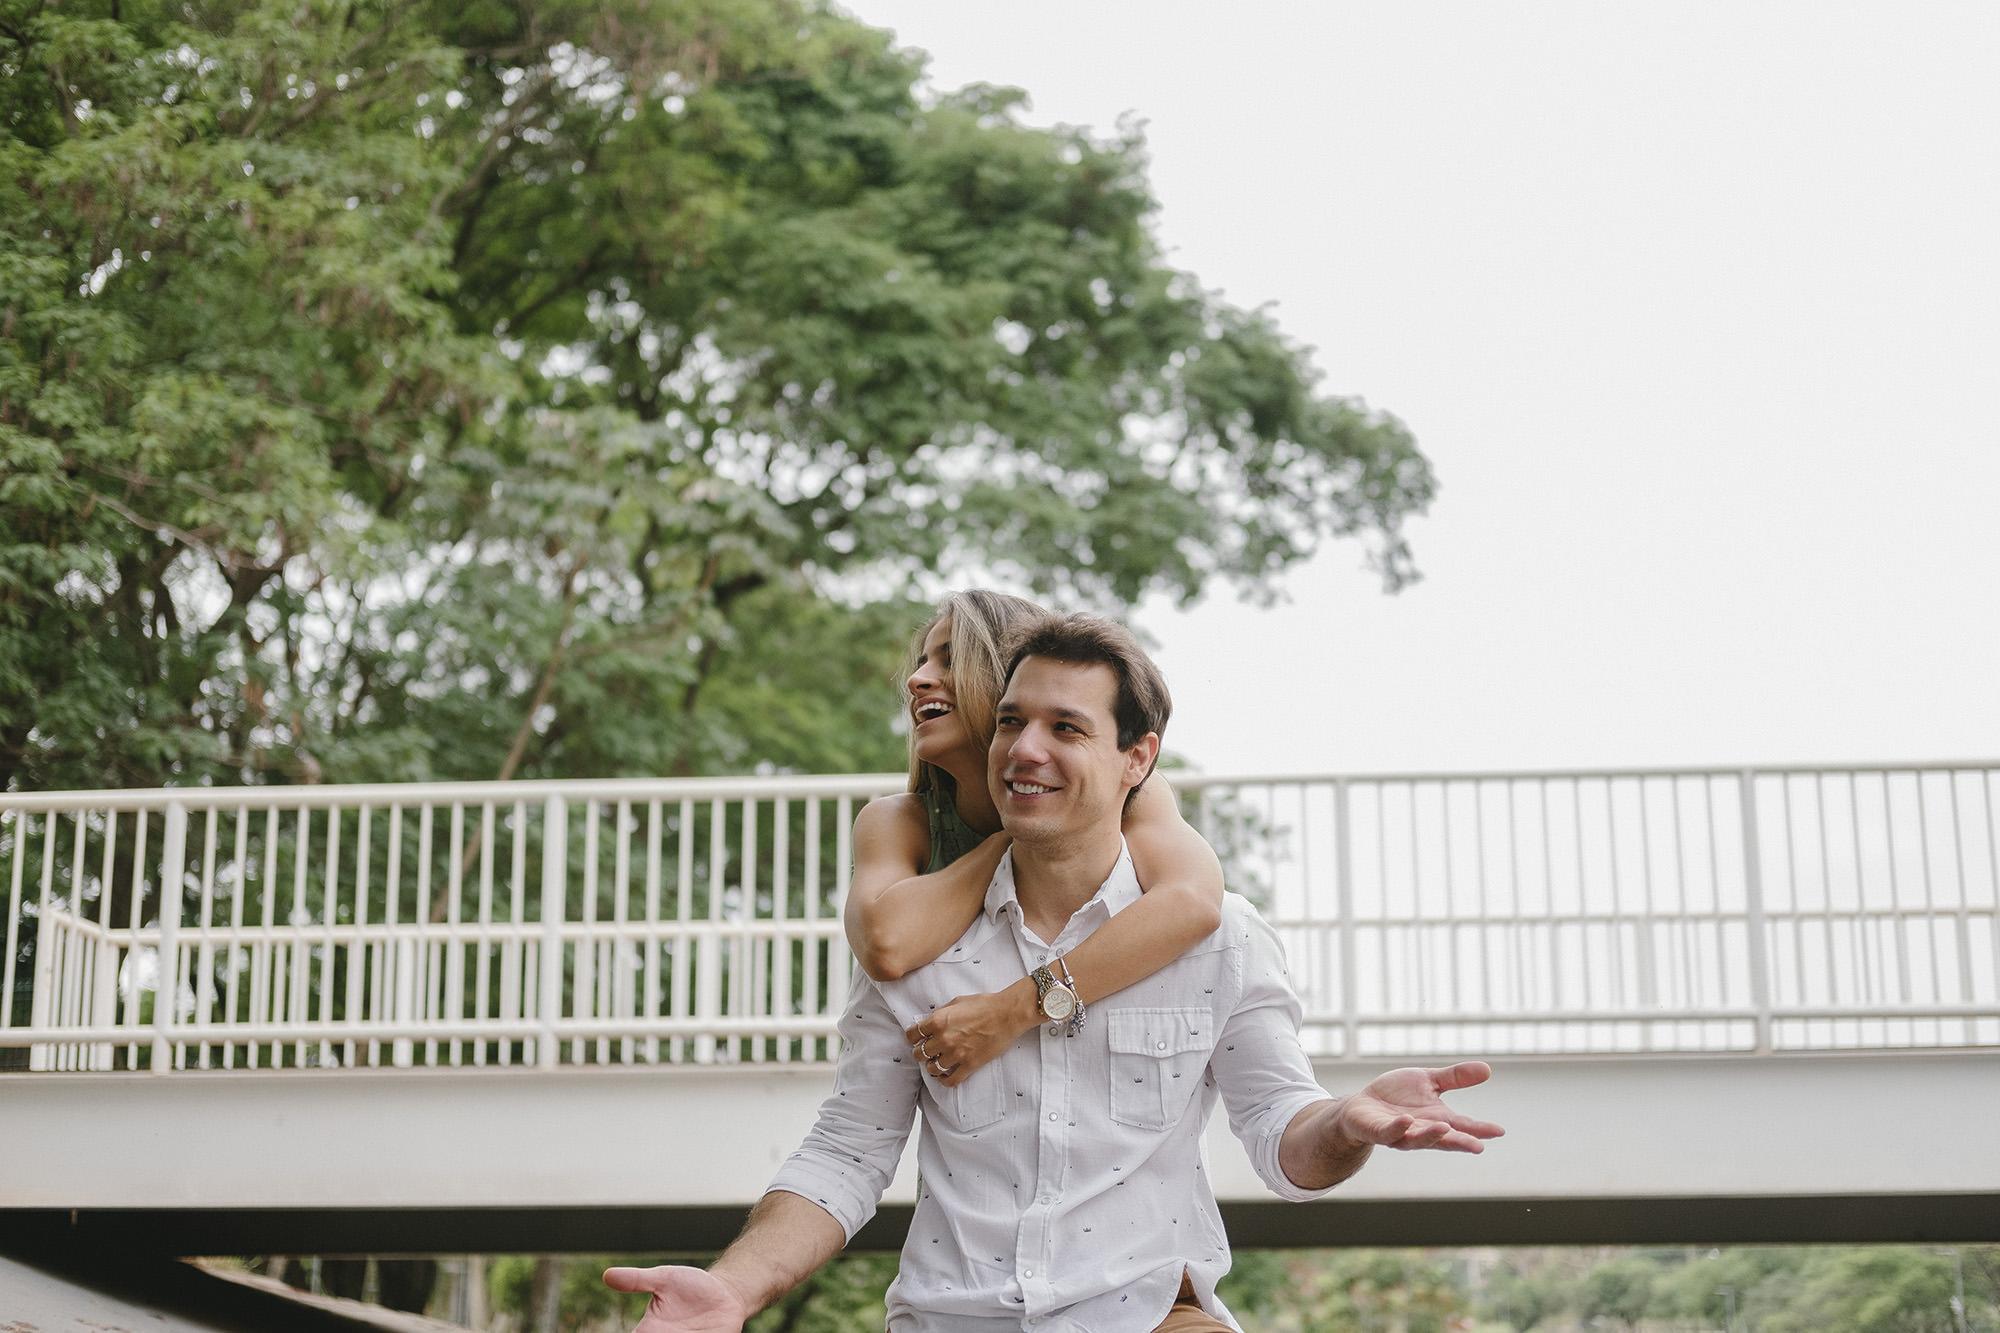 Laura e Rodrigo - Gustavo Semeghini - Ensaio - 10.jpg